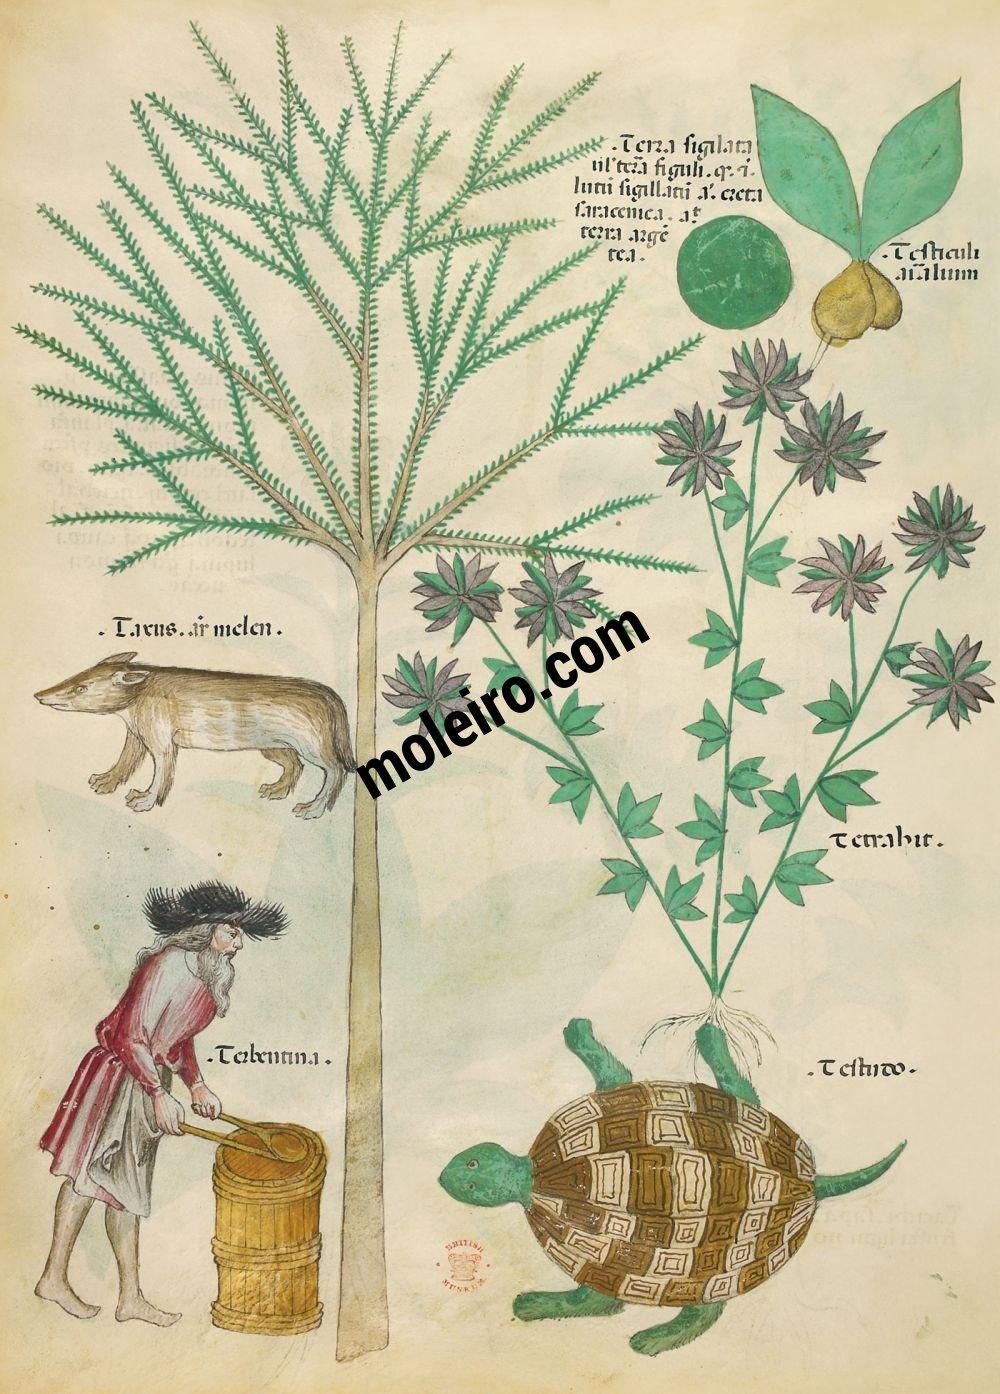 Tractatus de Herbis - Sloane 4016 f. 98v